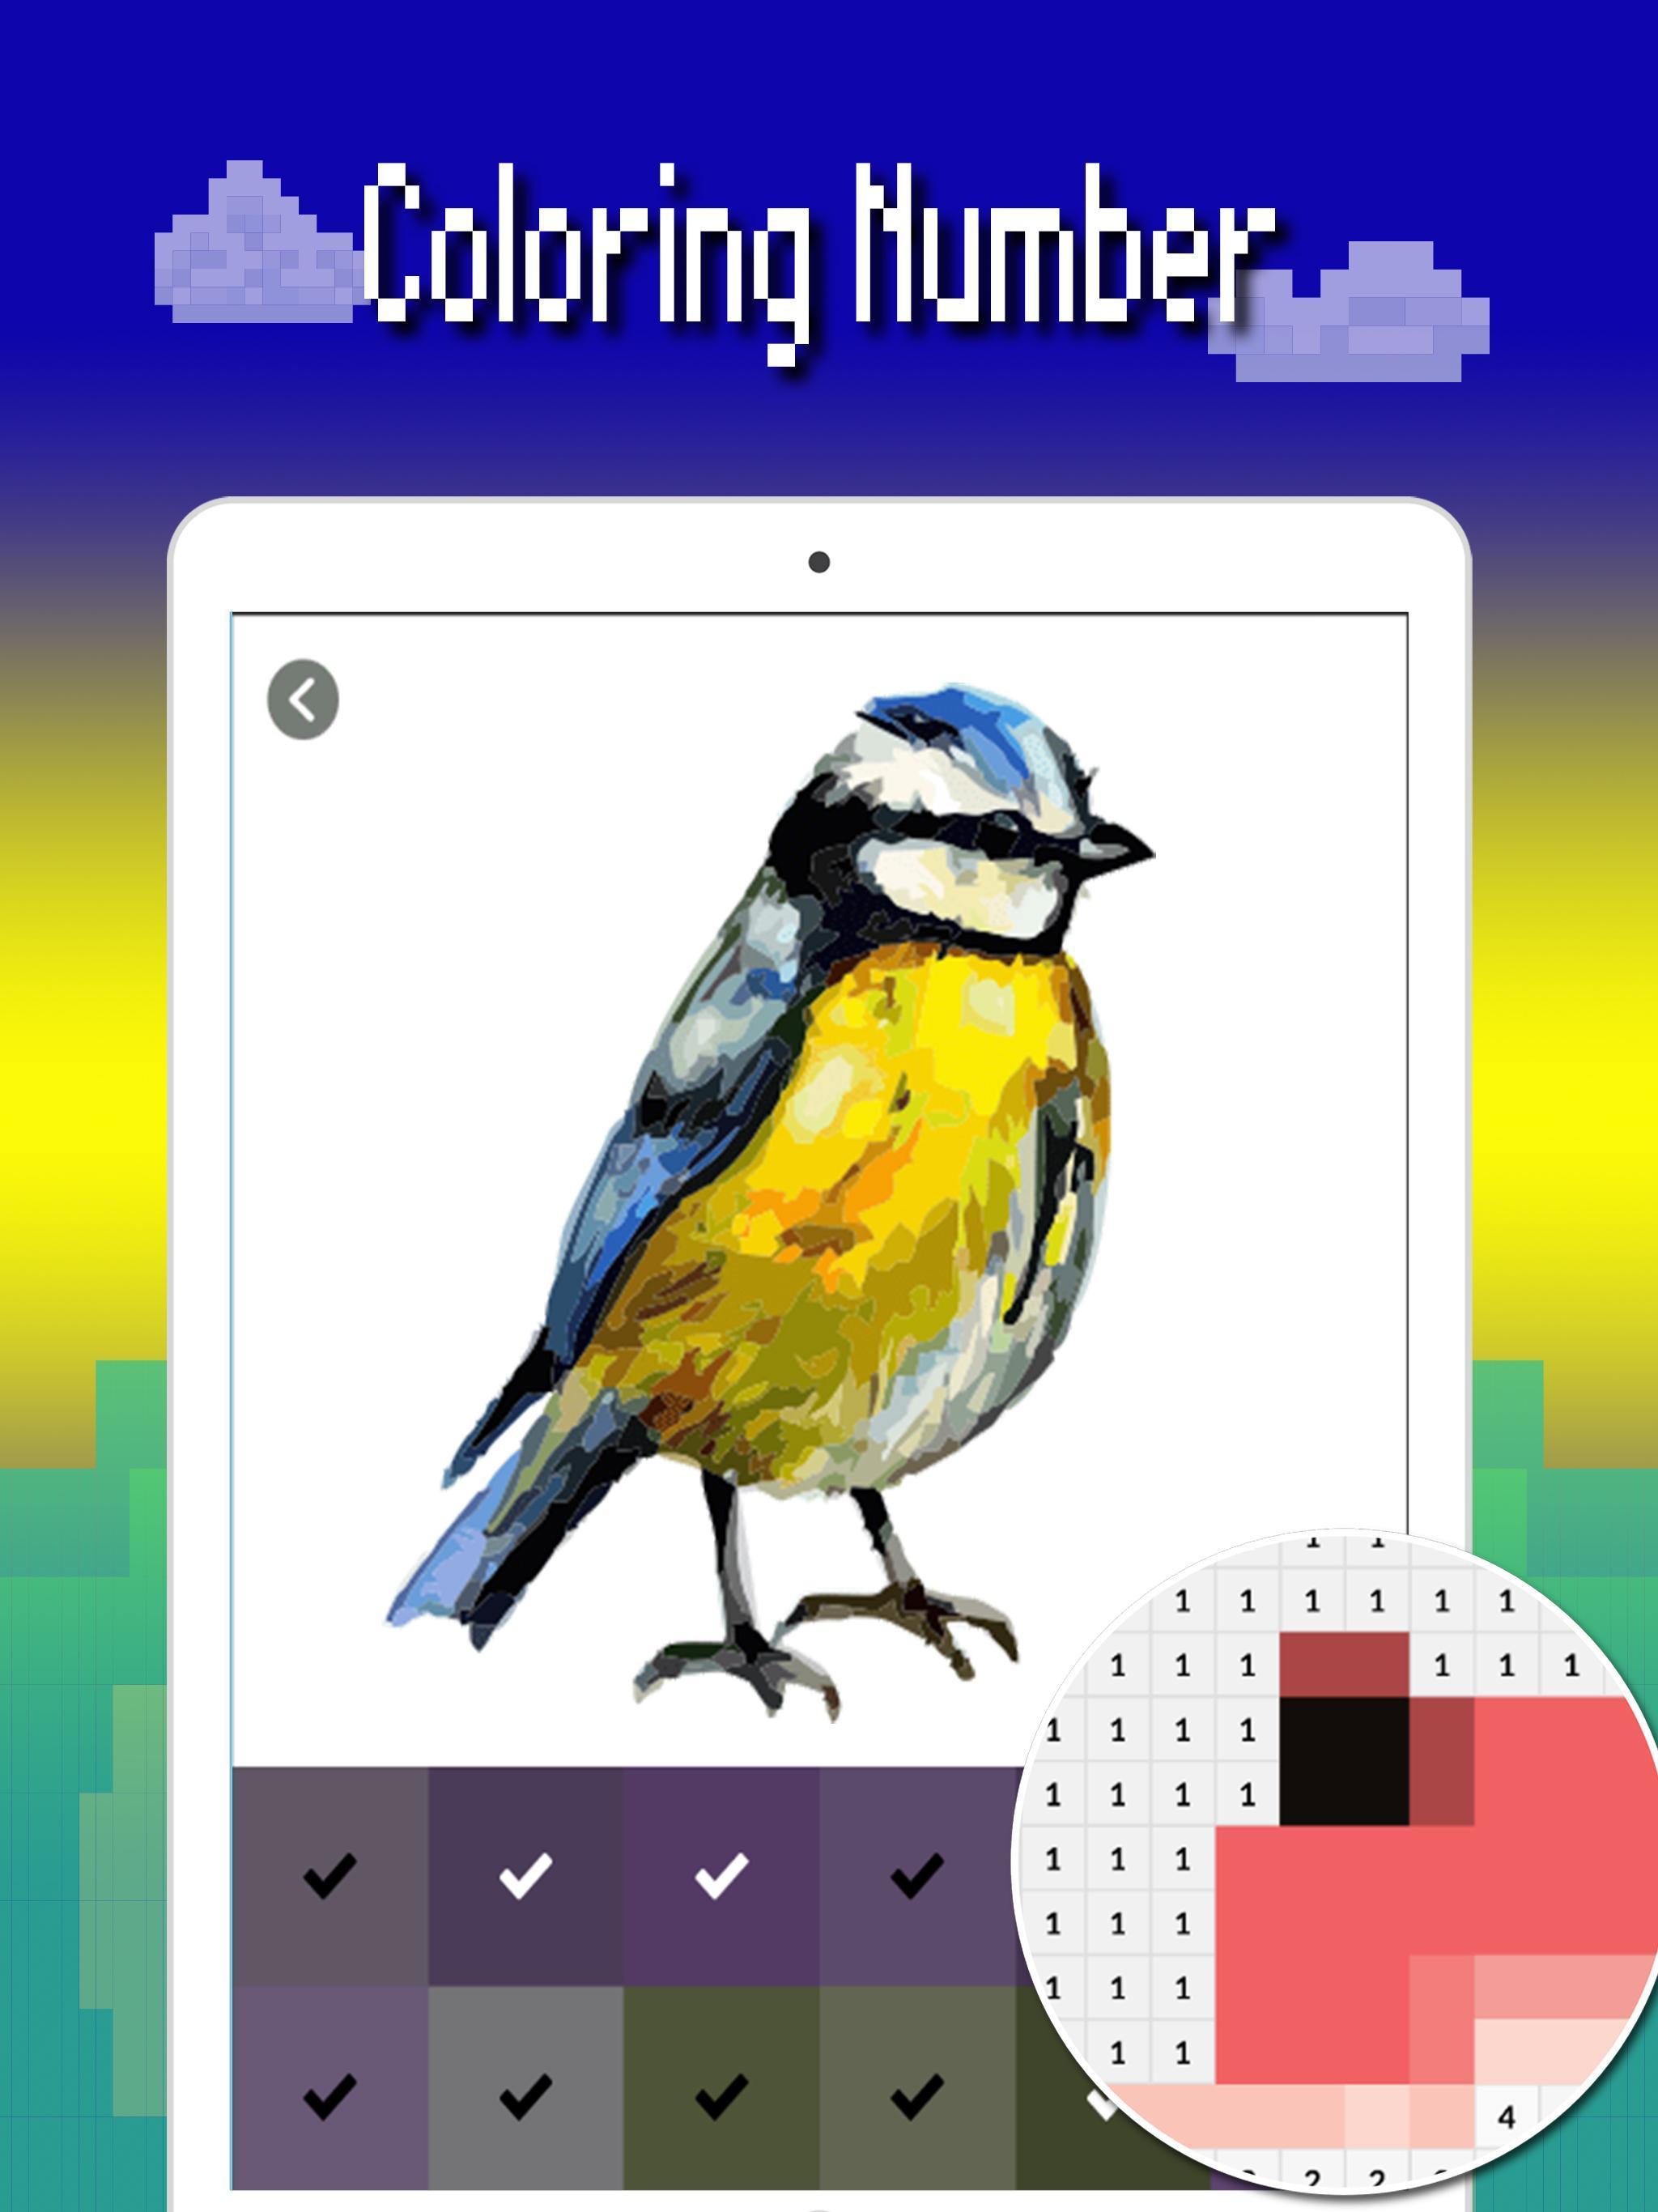 Android Icin Kuslar Renk Sayisi Piksel Sanat Kus Boyama 2019